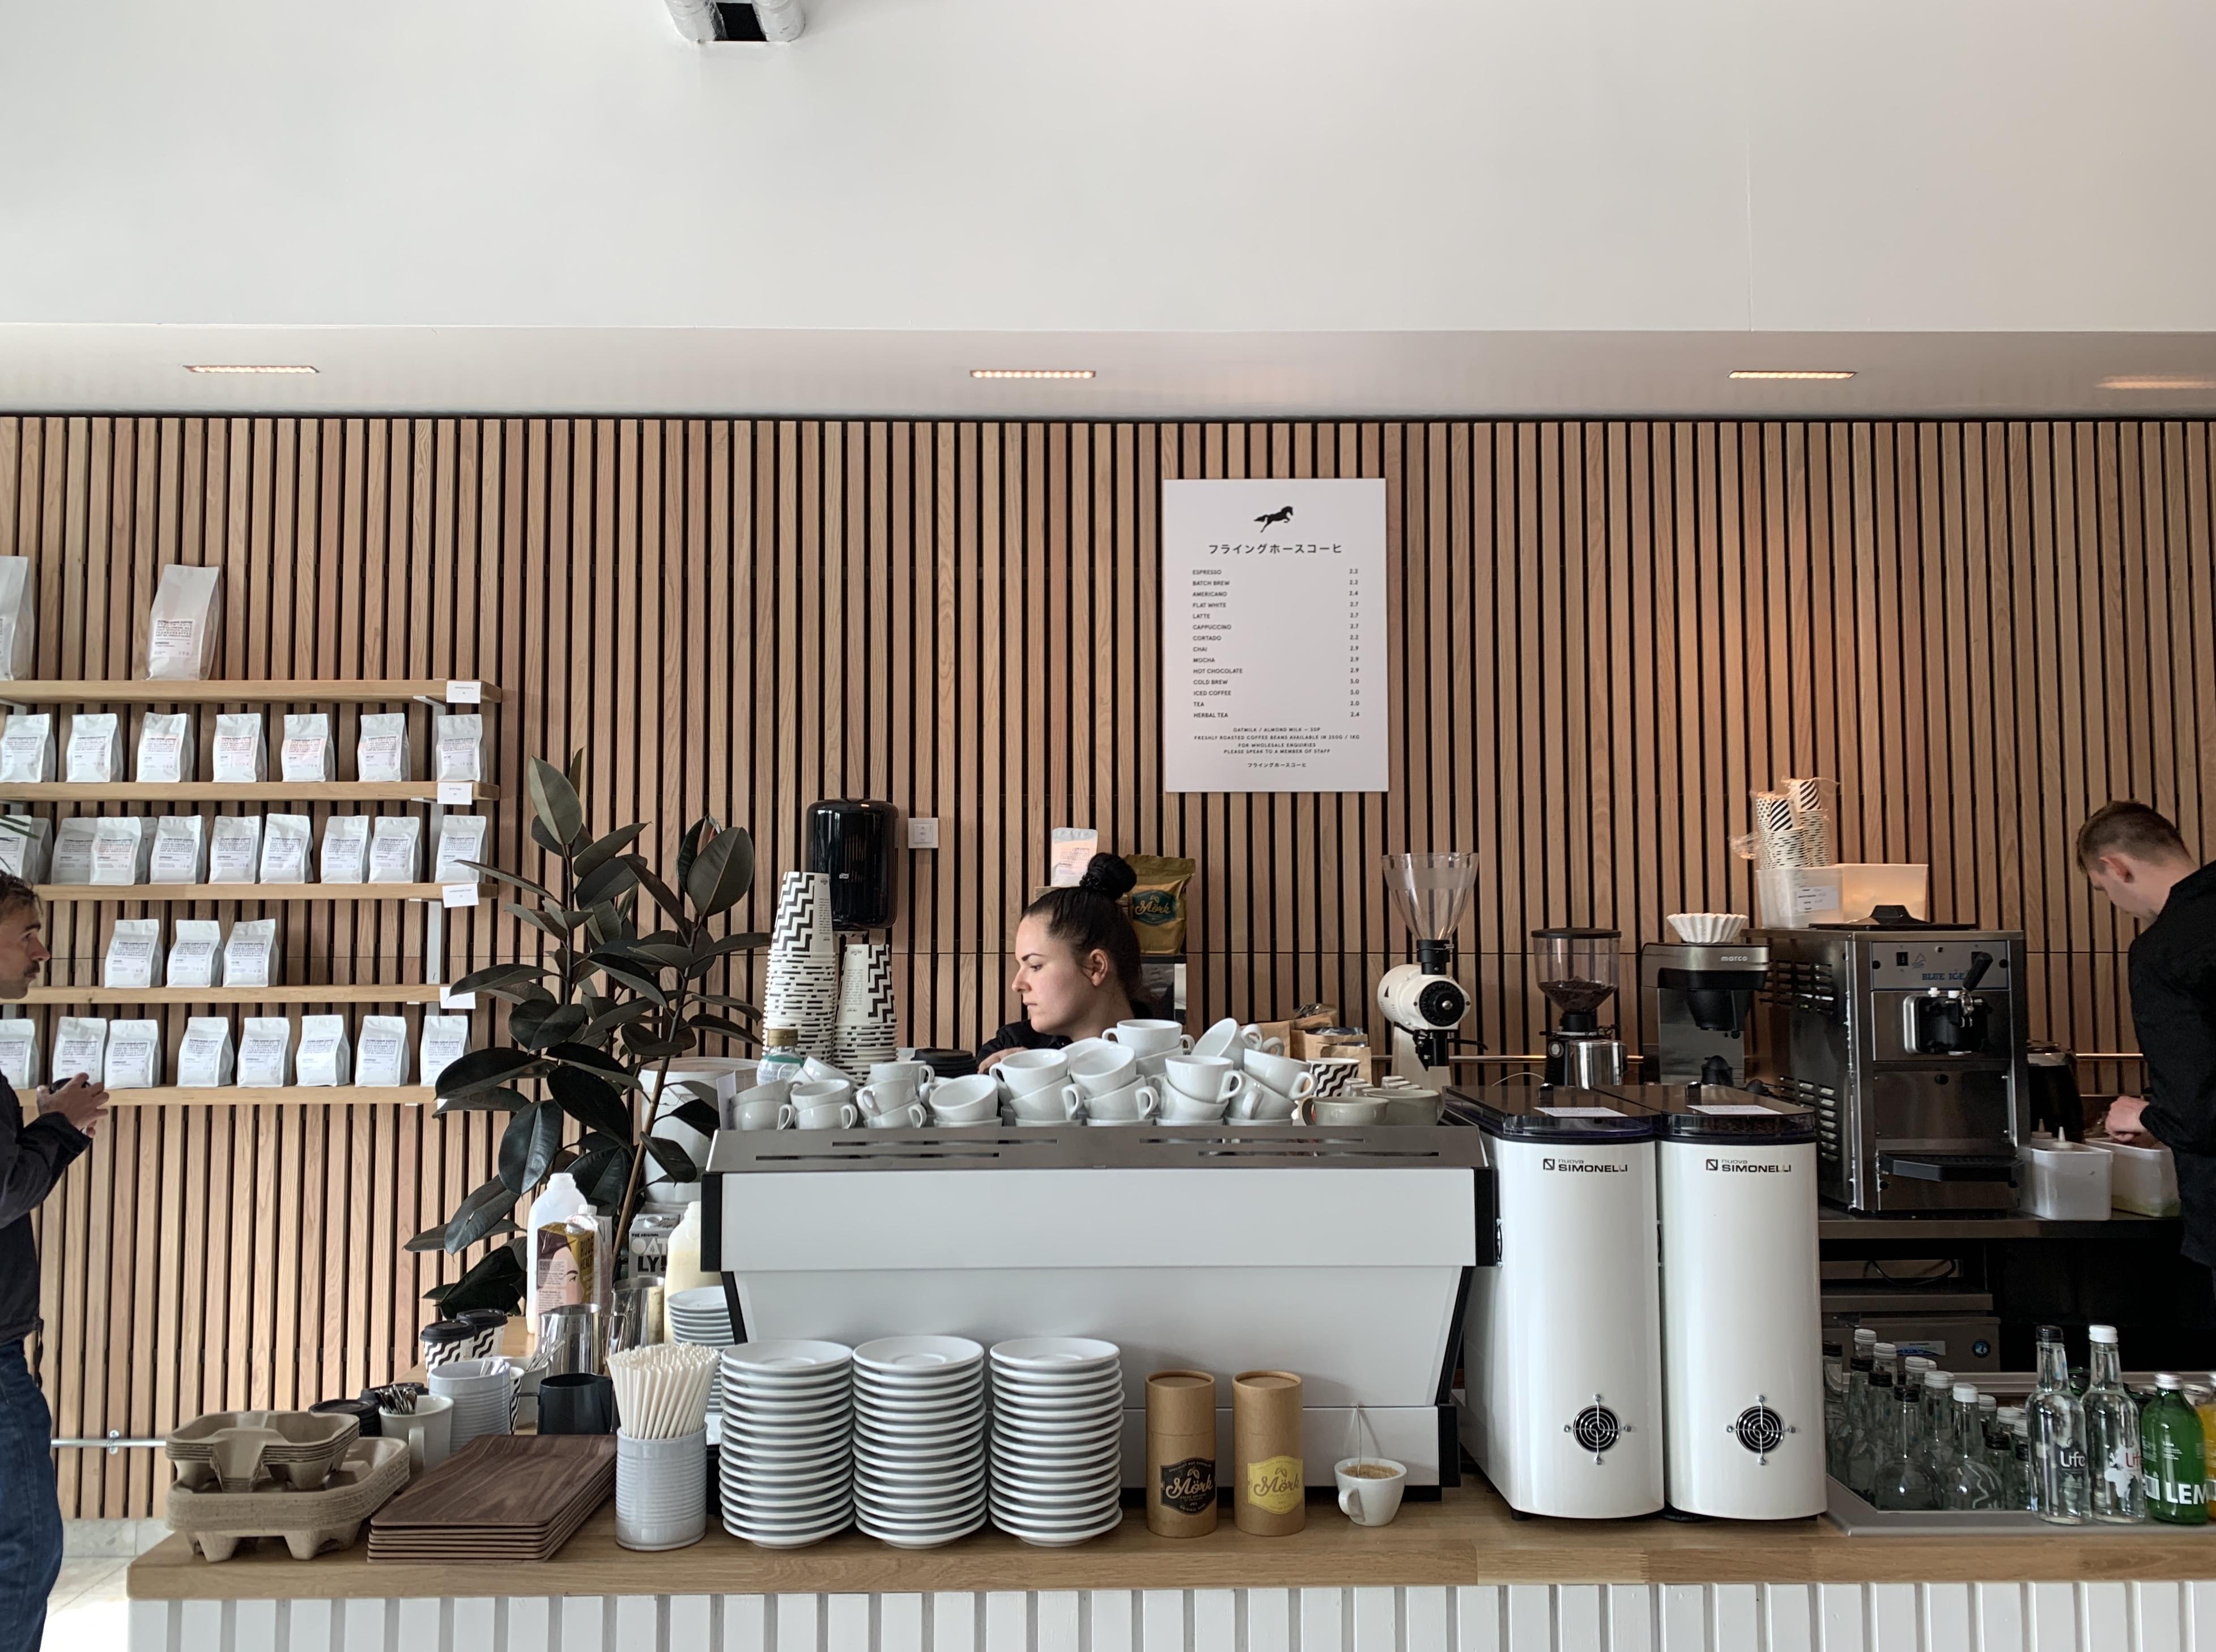 Flying Horse Espresso